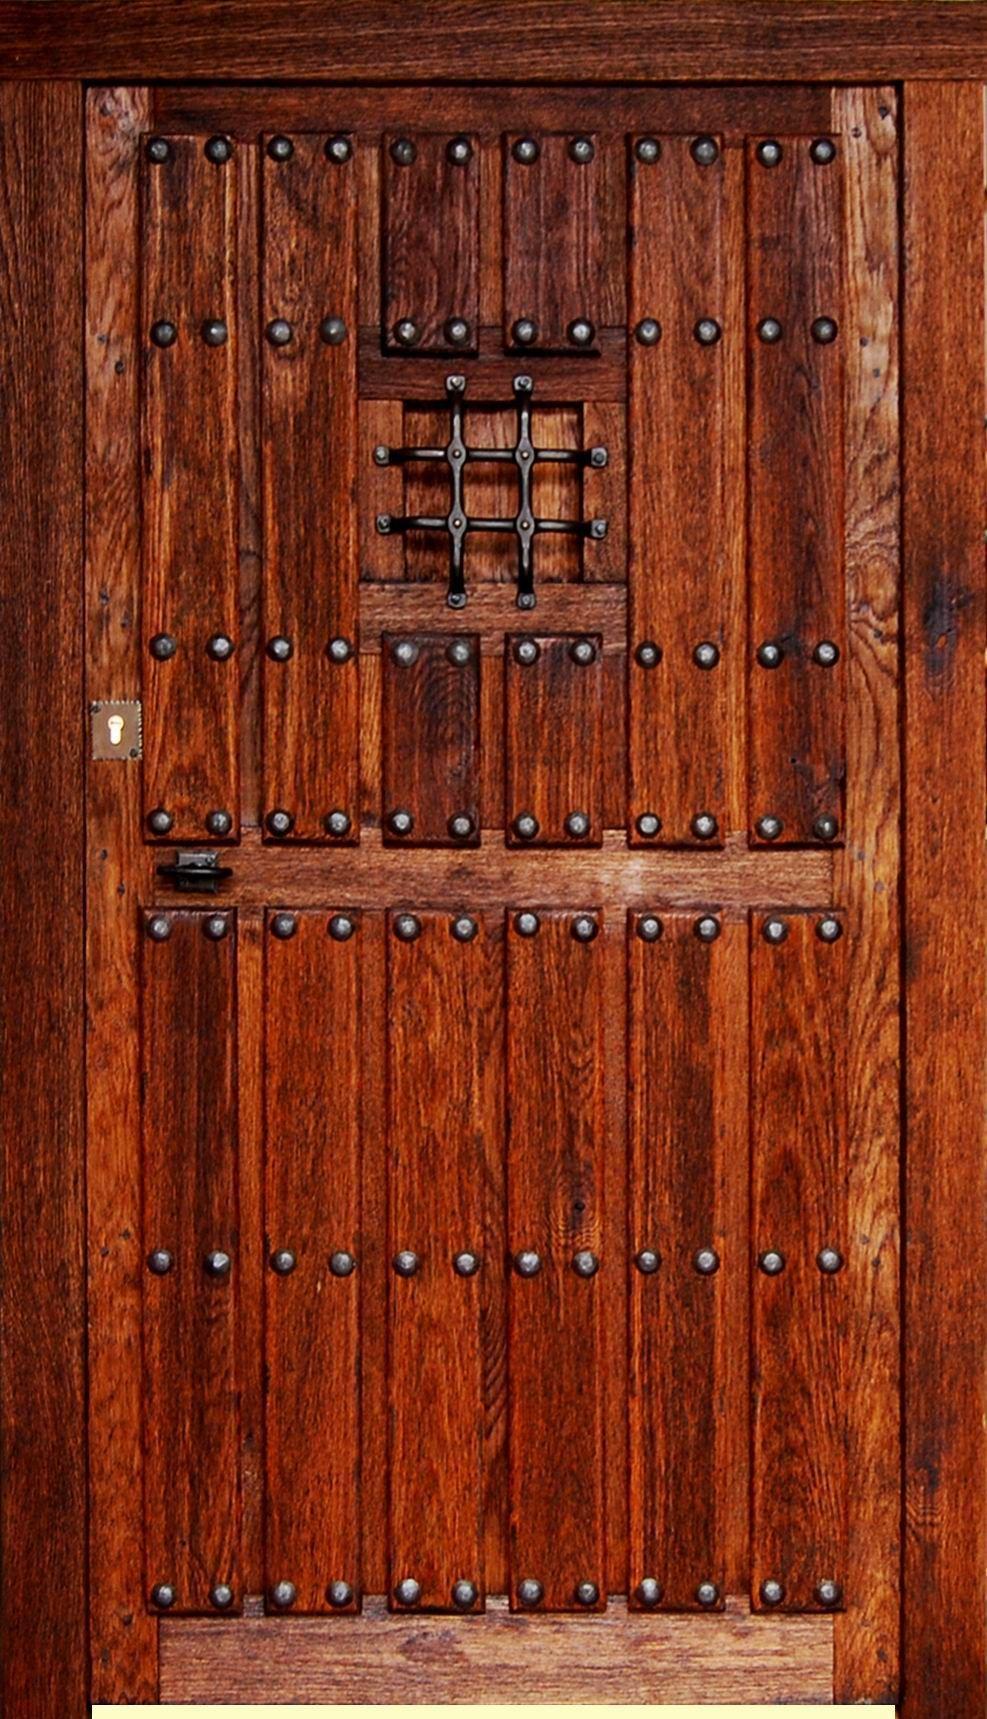 Puertas r sticas exterior buscar con google pinteres for Puertas rusticas exterior baratas